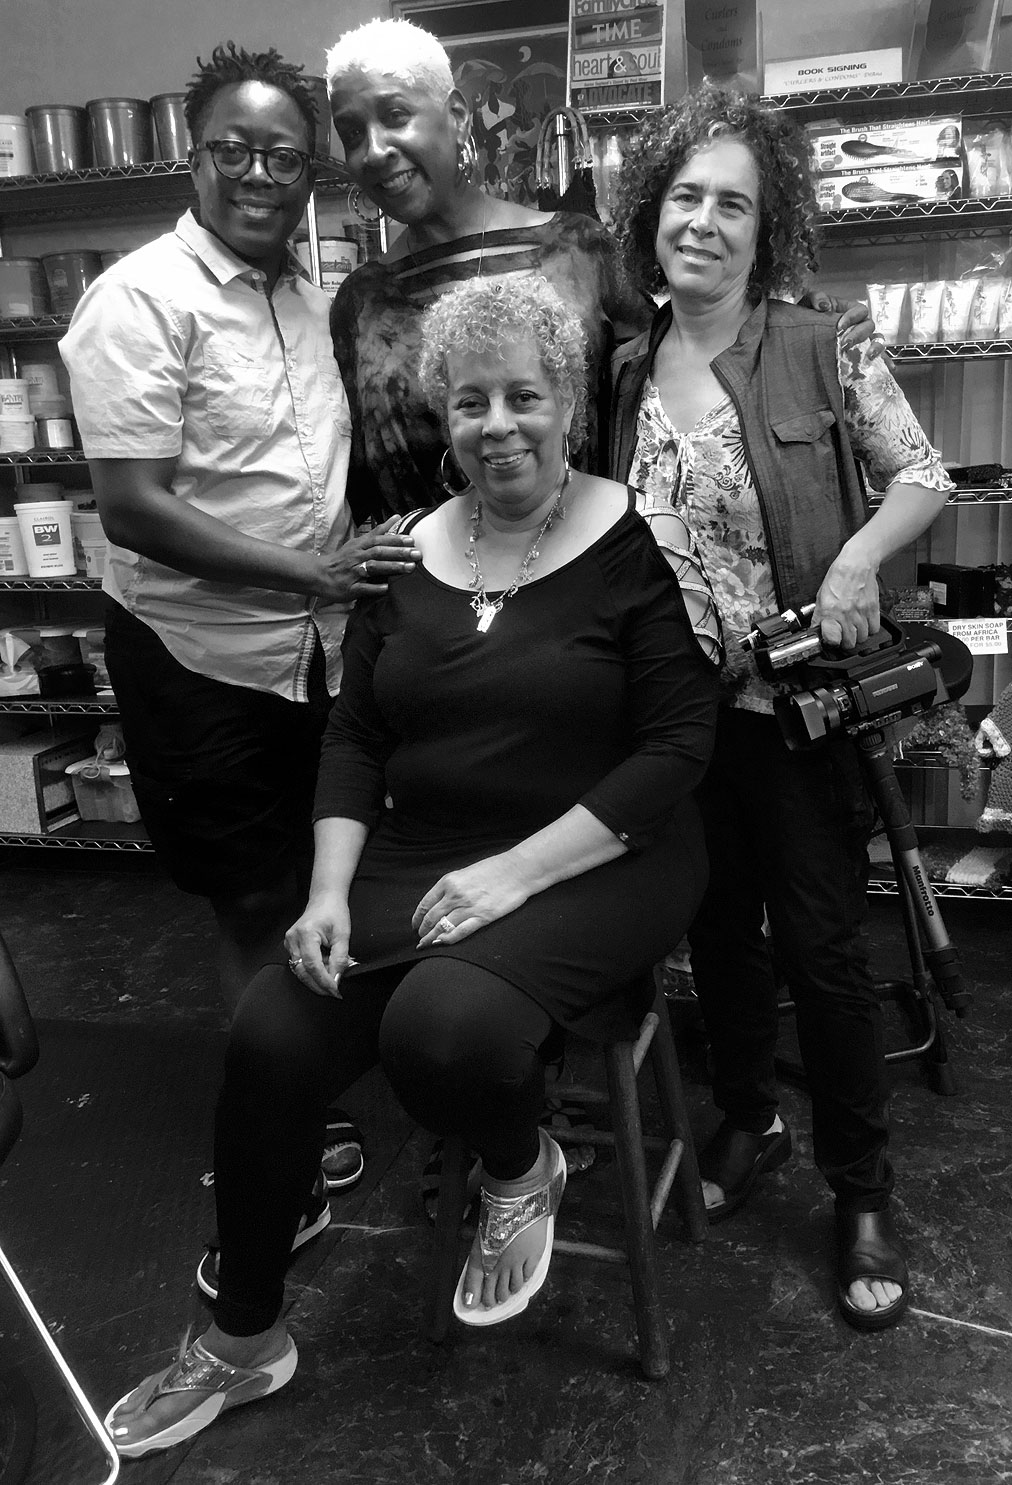 Director Cheryl Dunye, Dr. Bambi Gaddist, DiAna DiAna and Director Ellen Spiro